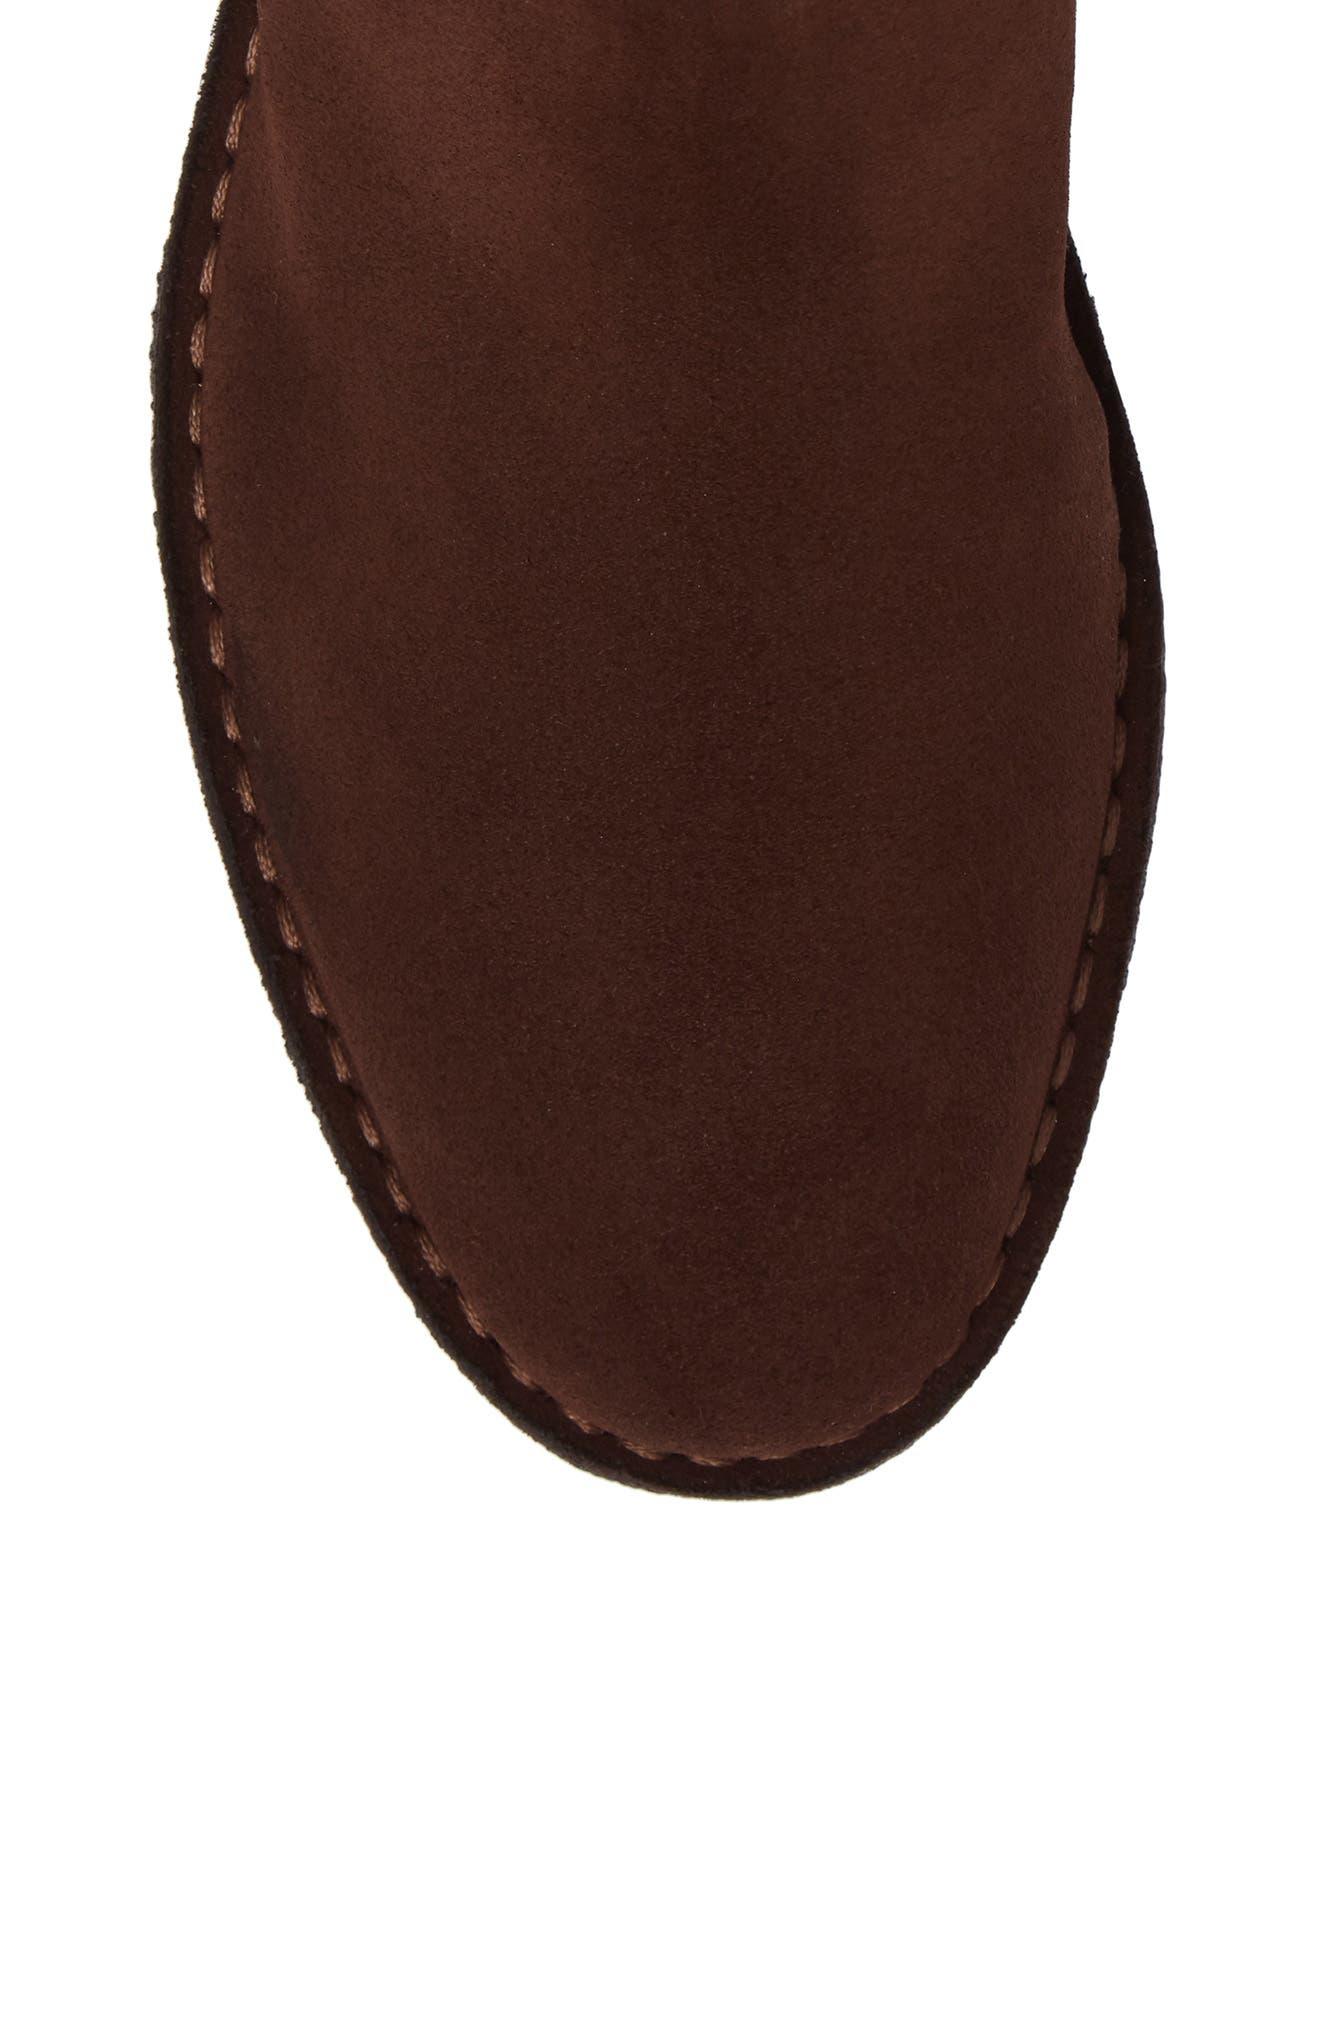 Oscar Chelsea Boot,                             Alternate thumbnail 5, color,                             Medium Brown